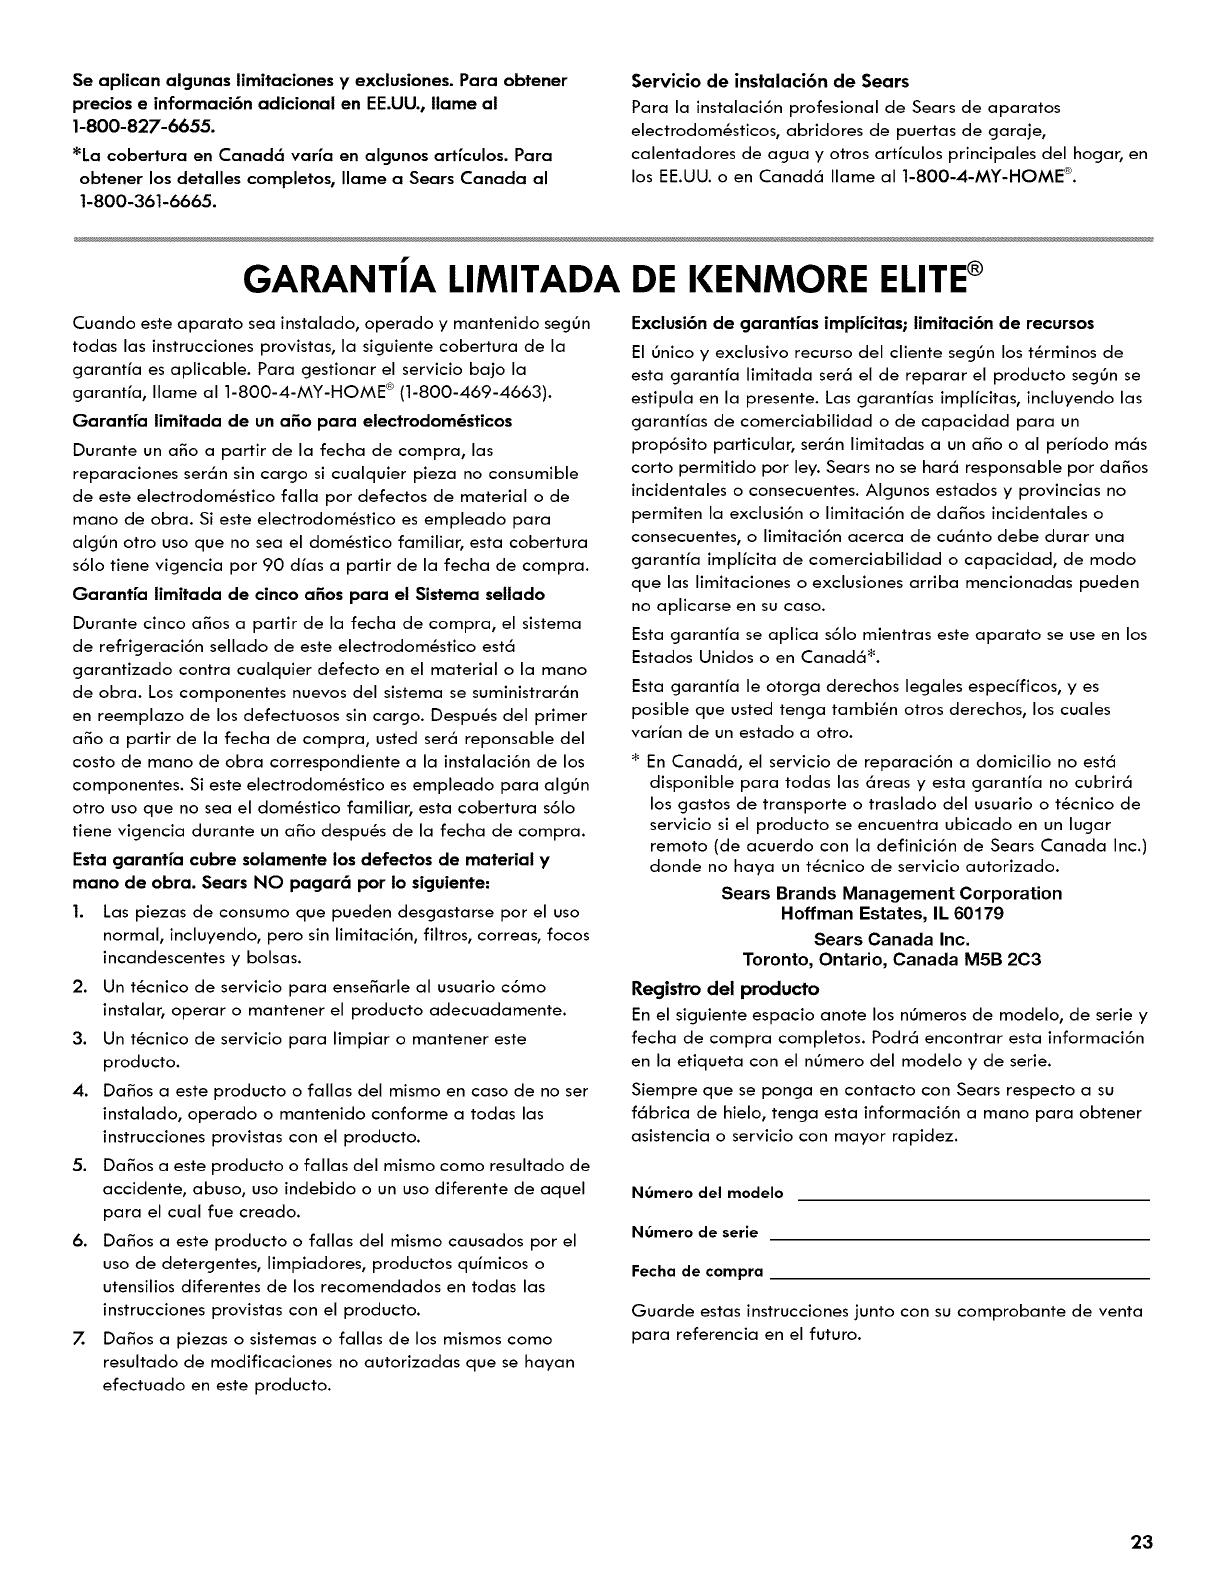 Encantador Asistente Médico Reanudar Habilidades Informáticas Molde ...